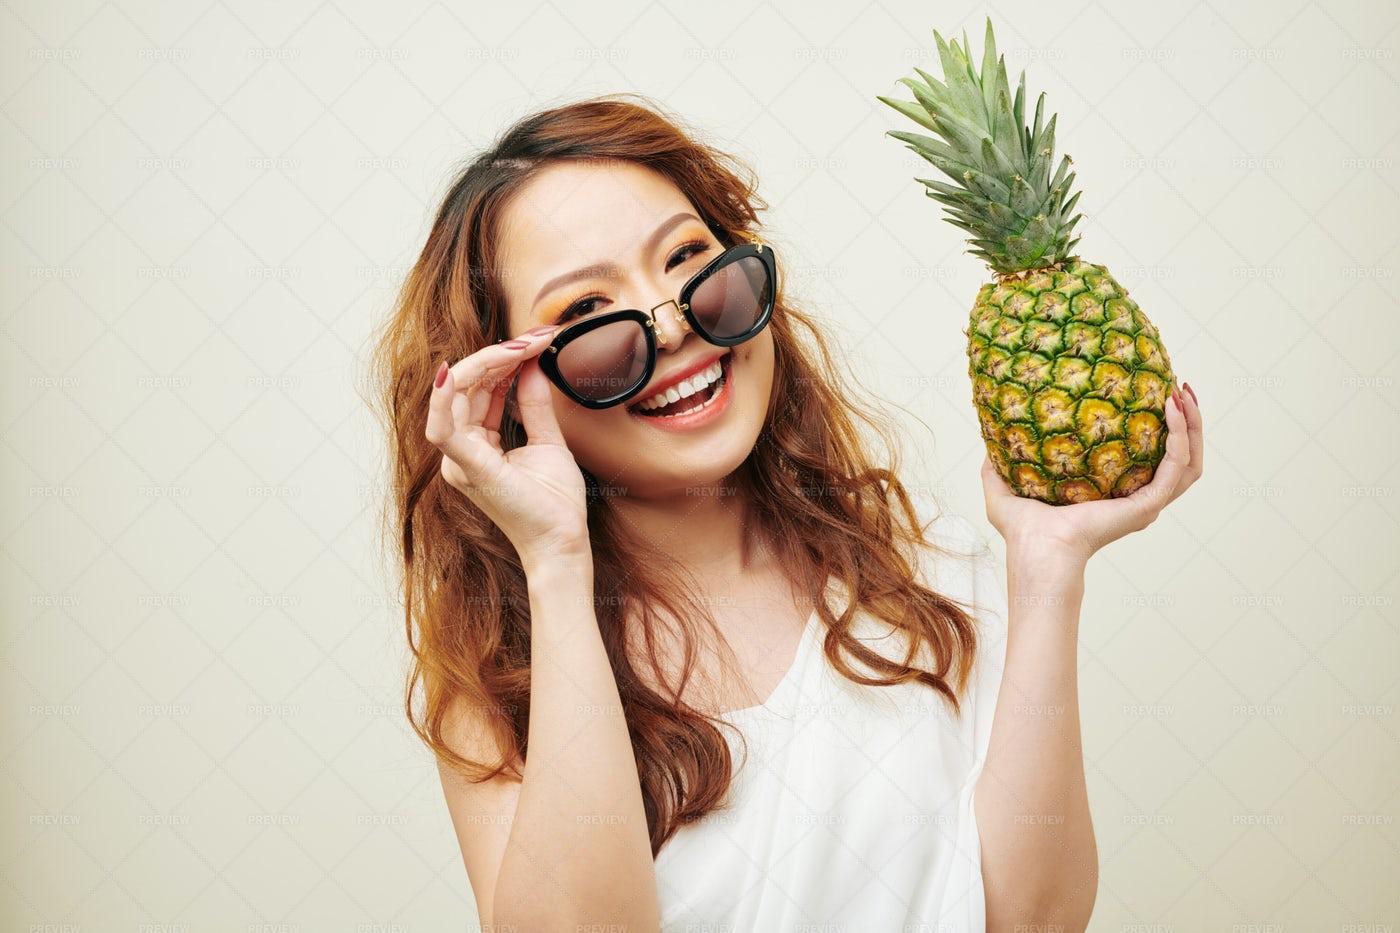 Asian Girl With Exotic Fruit: Stock Photos